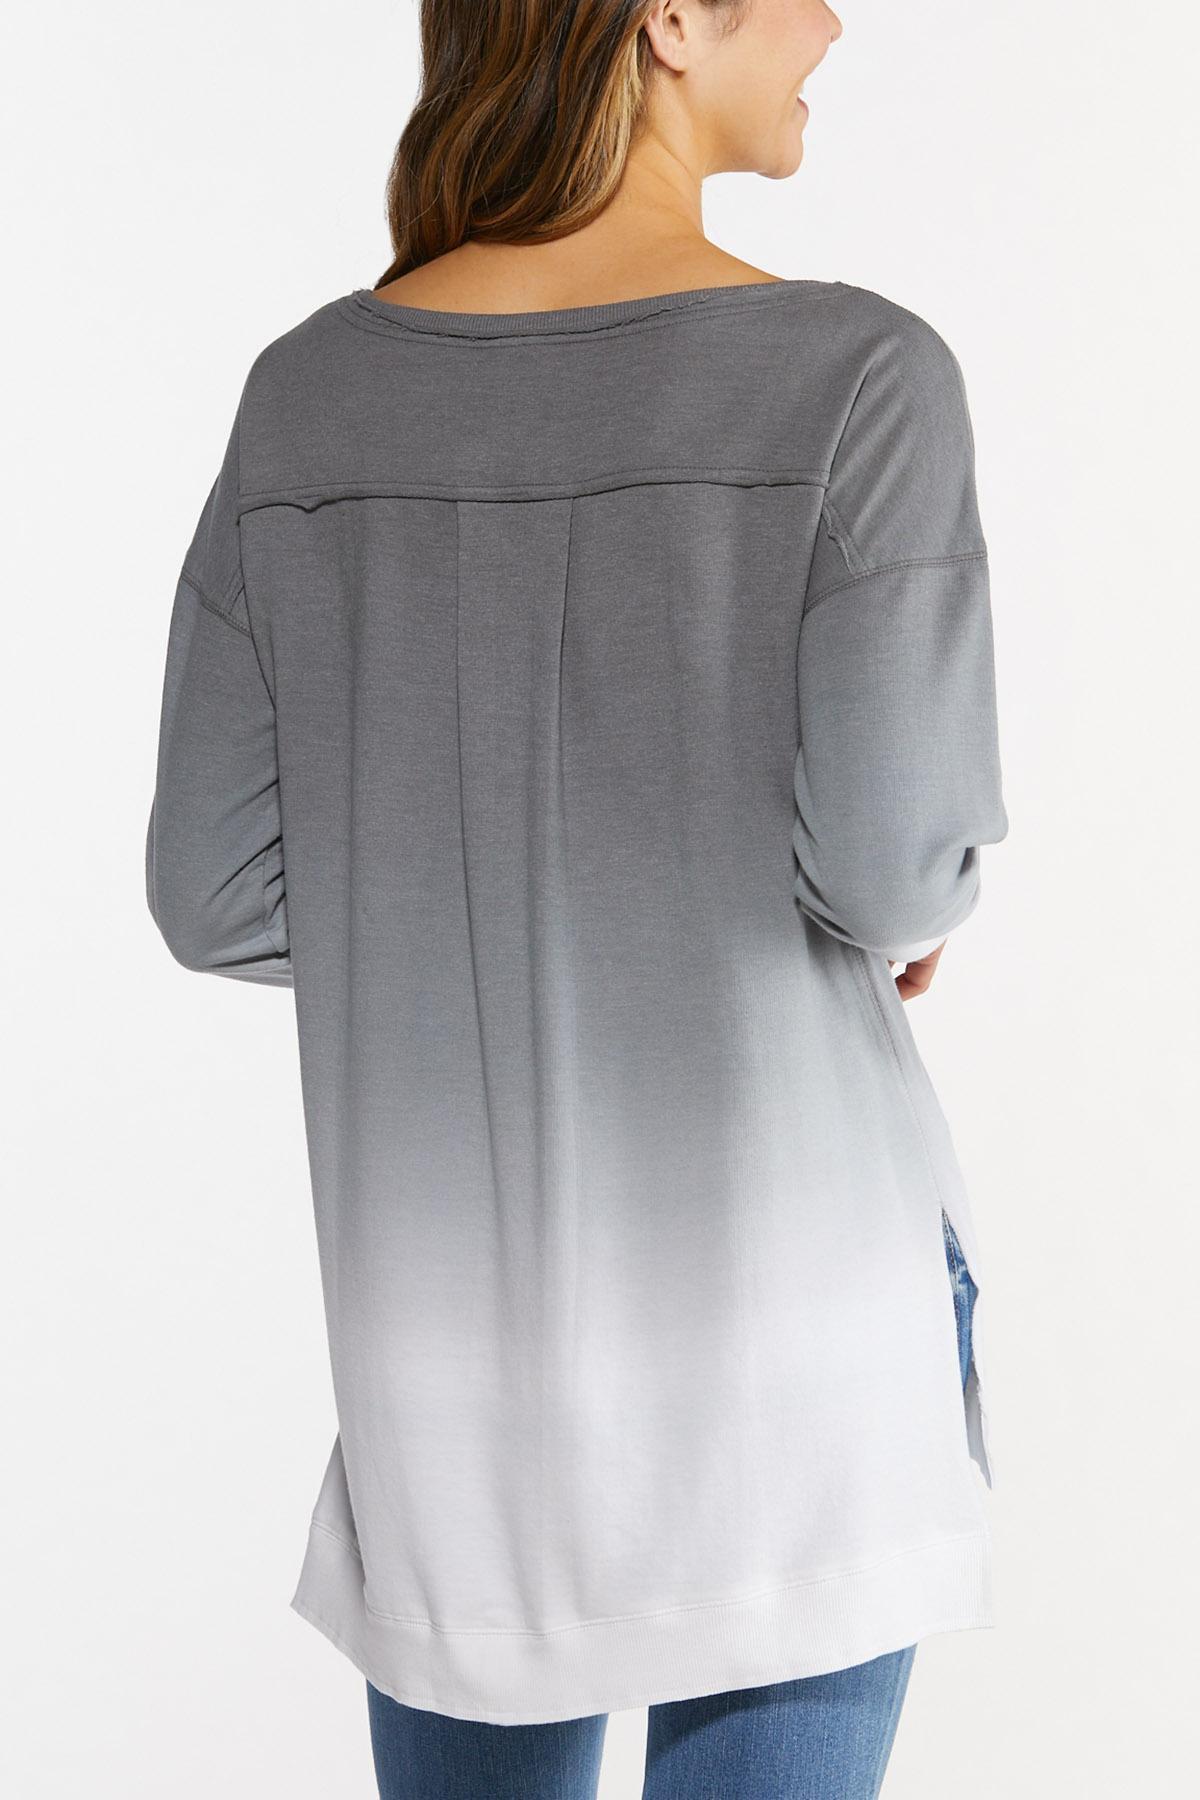 Plus Size Ombre Sweatshirt (Item #44686035)